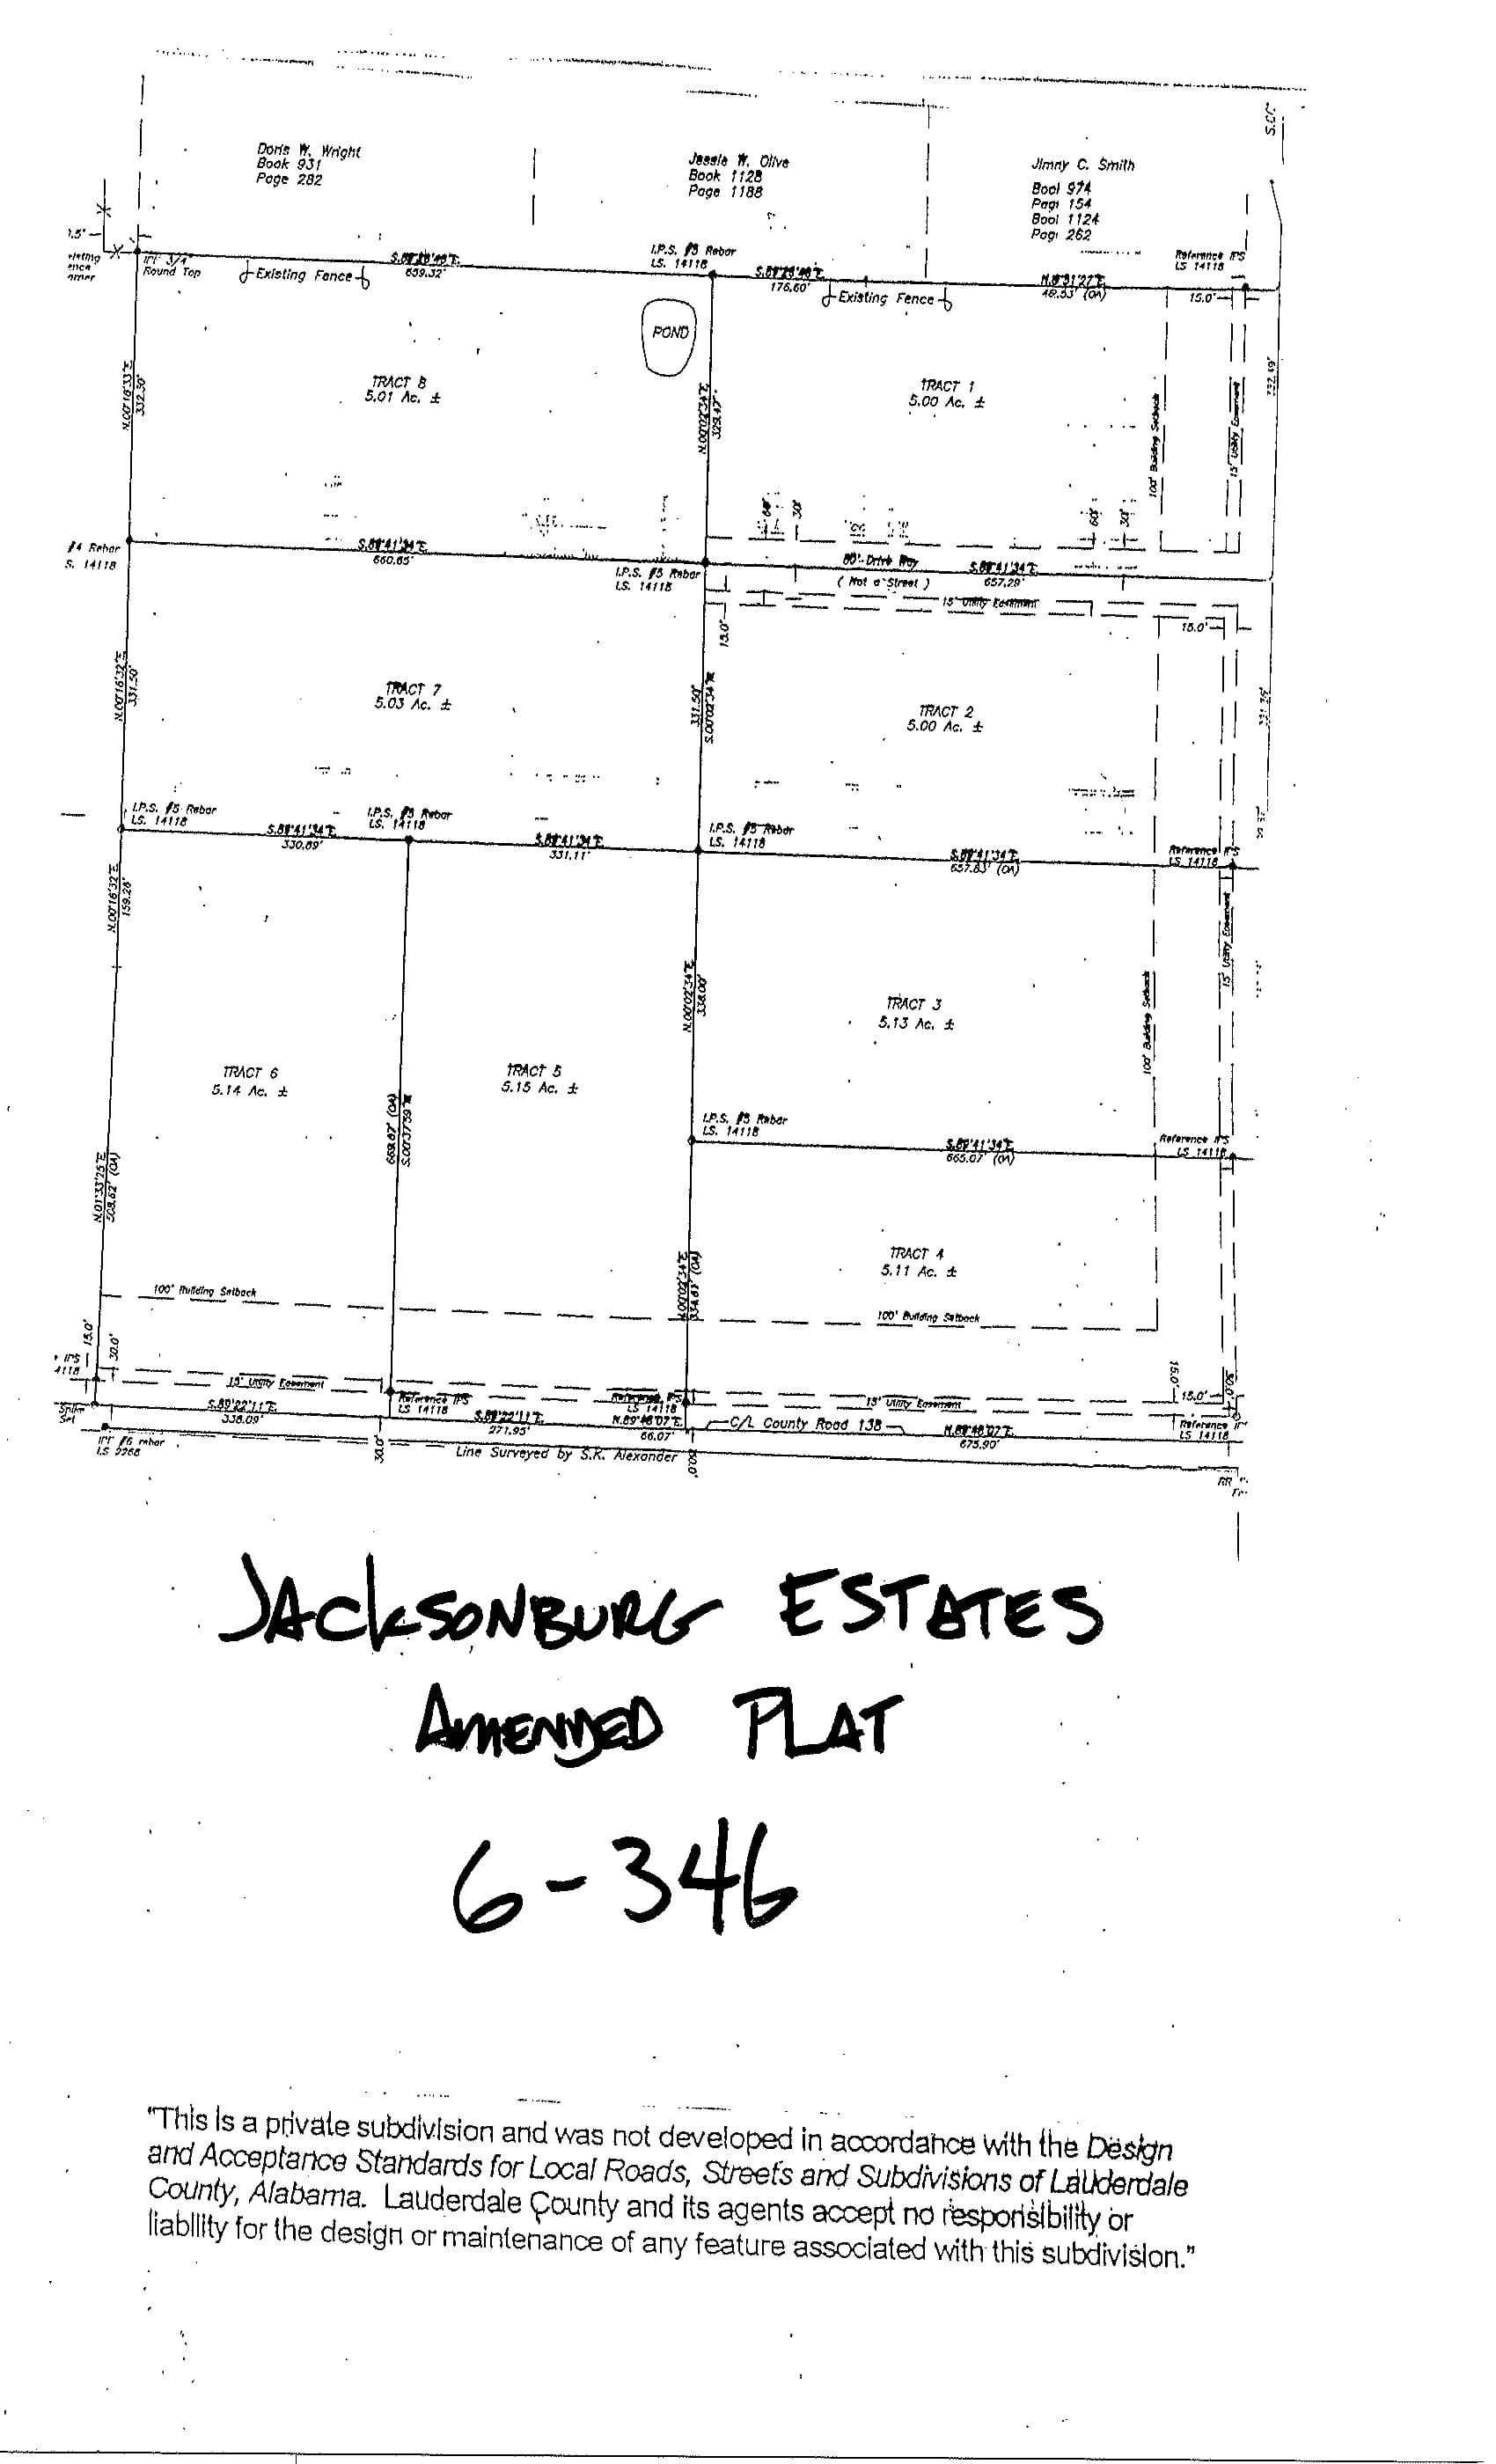 Jacksonburg estates- plats-1.jpg